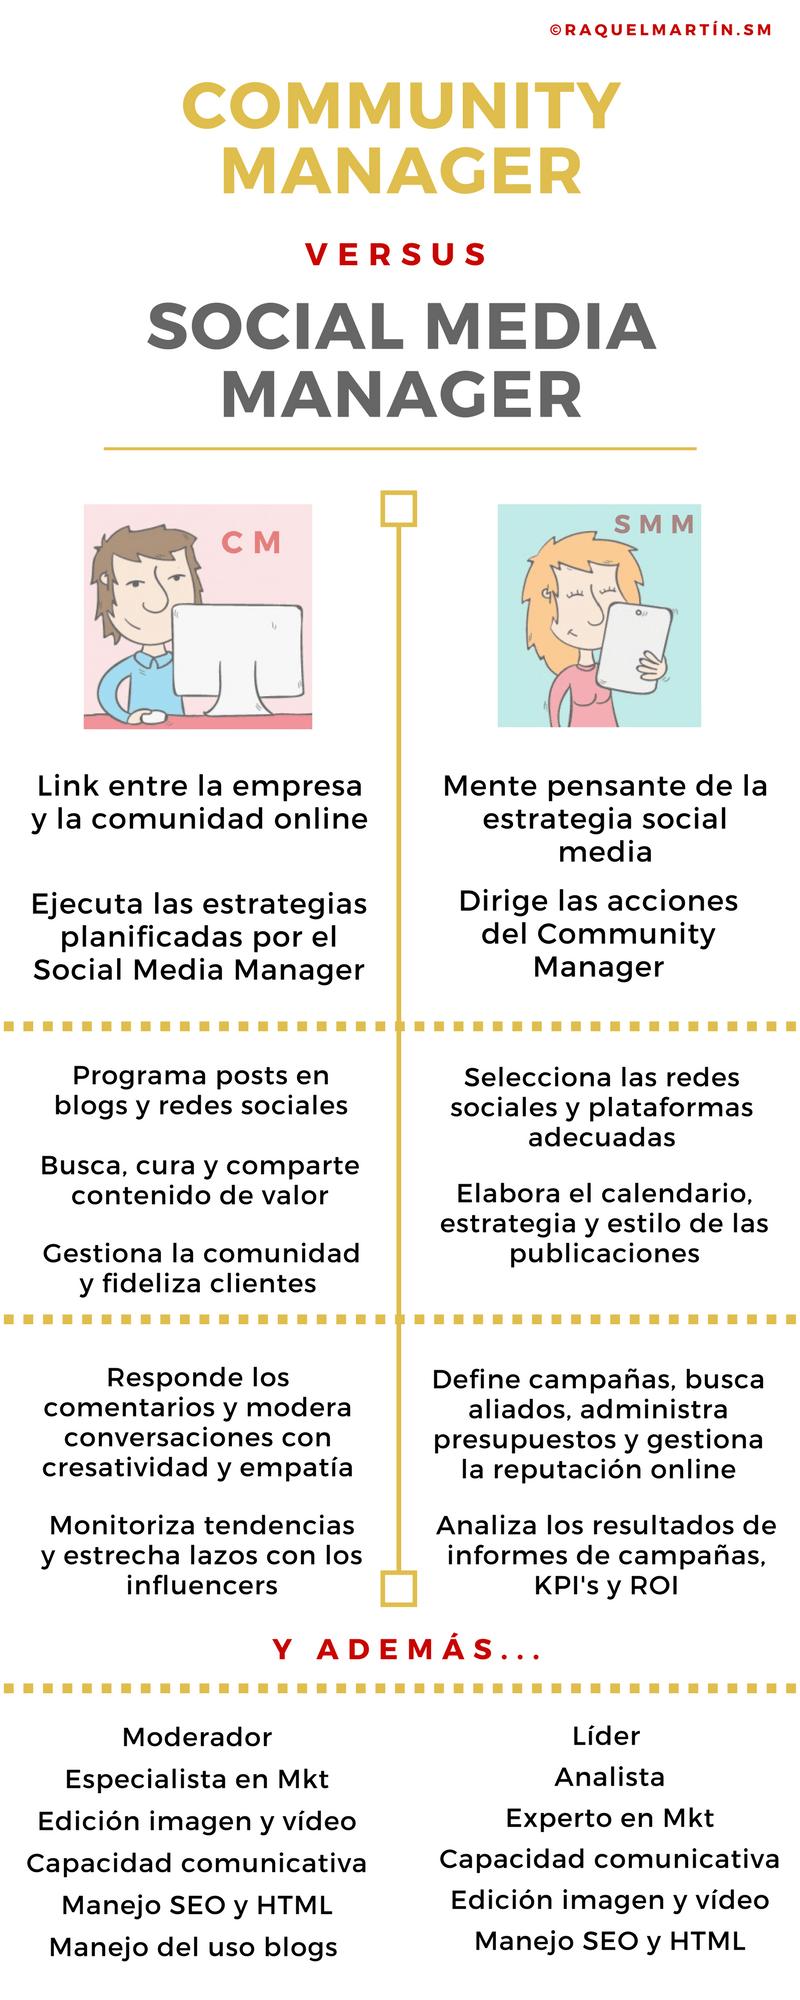 Infografia - Community Manager vs Social Media Manager #infografia #infographic #socialmedia - TICs y Formación